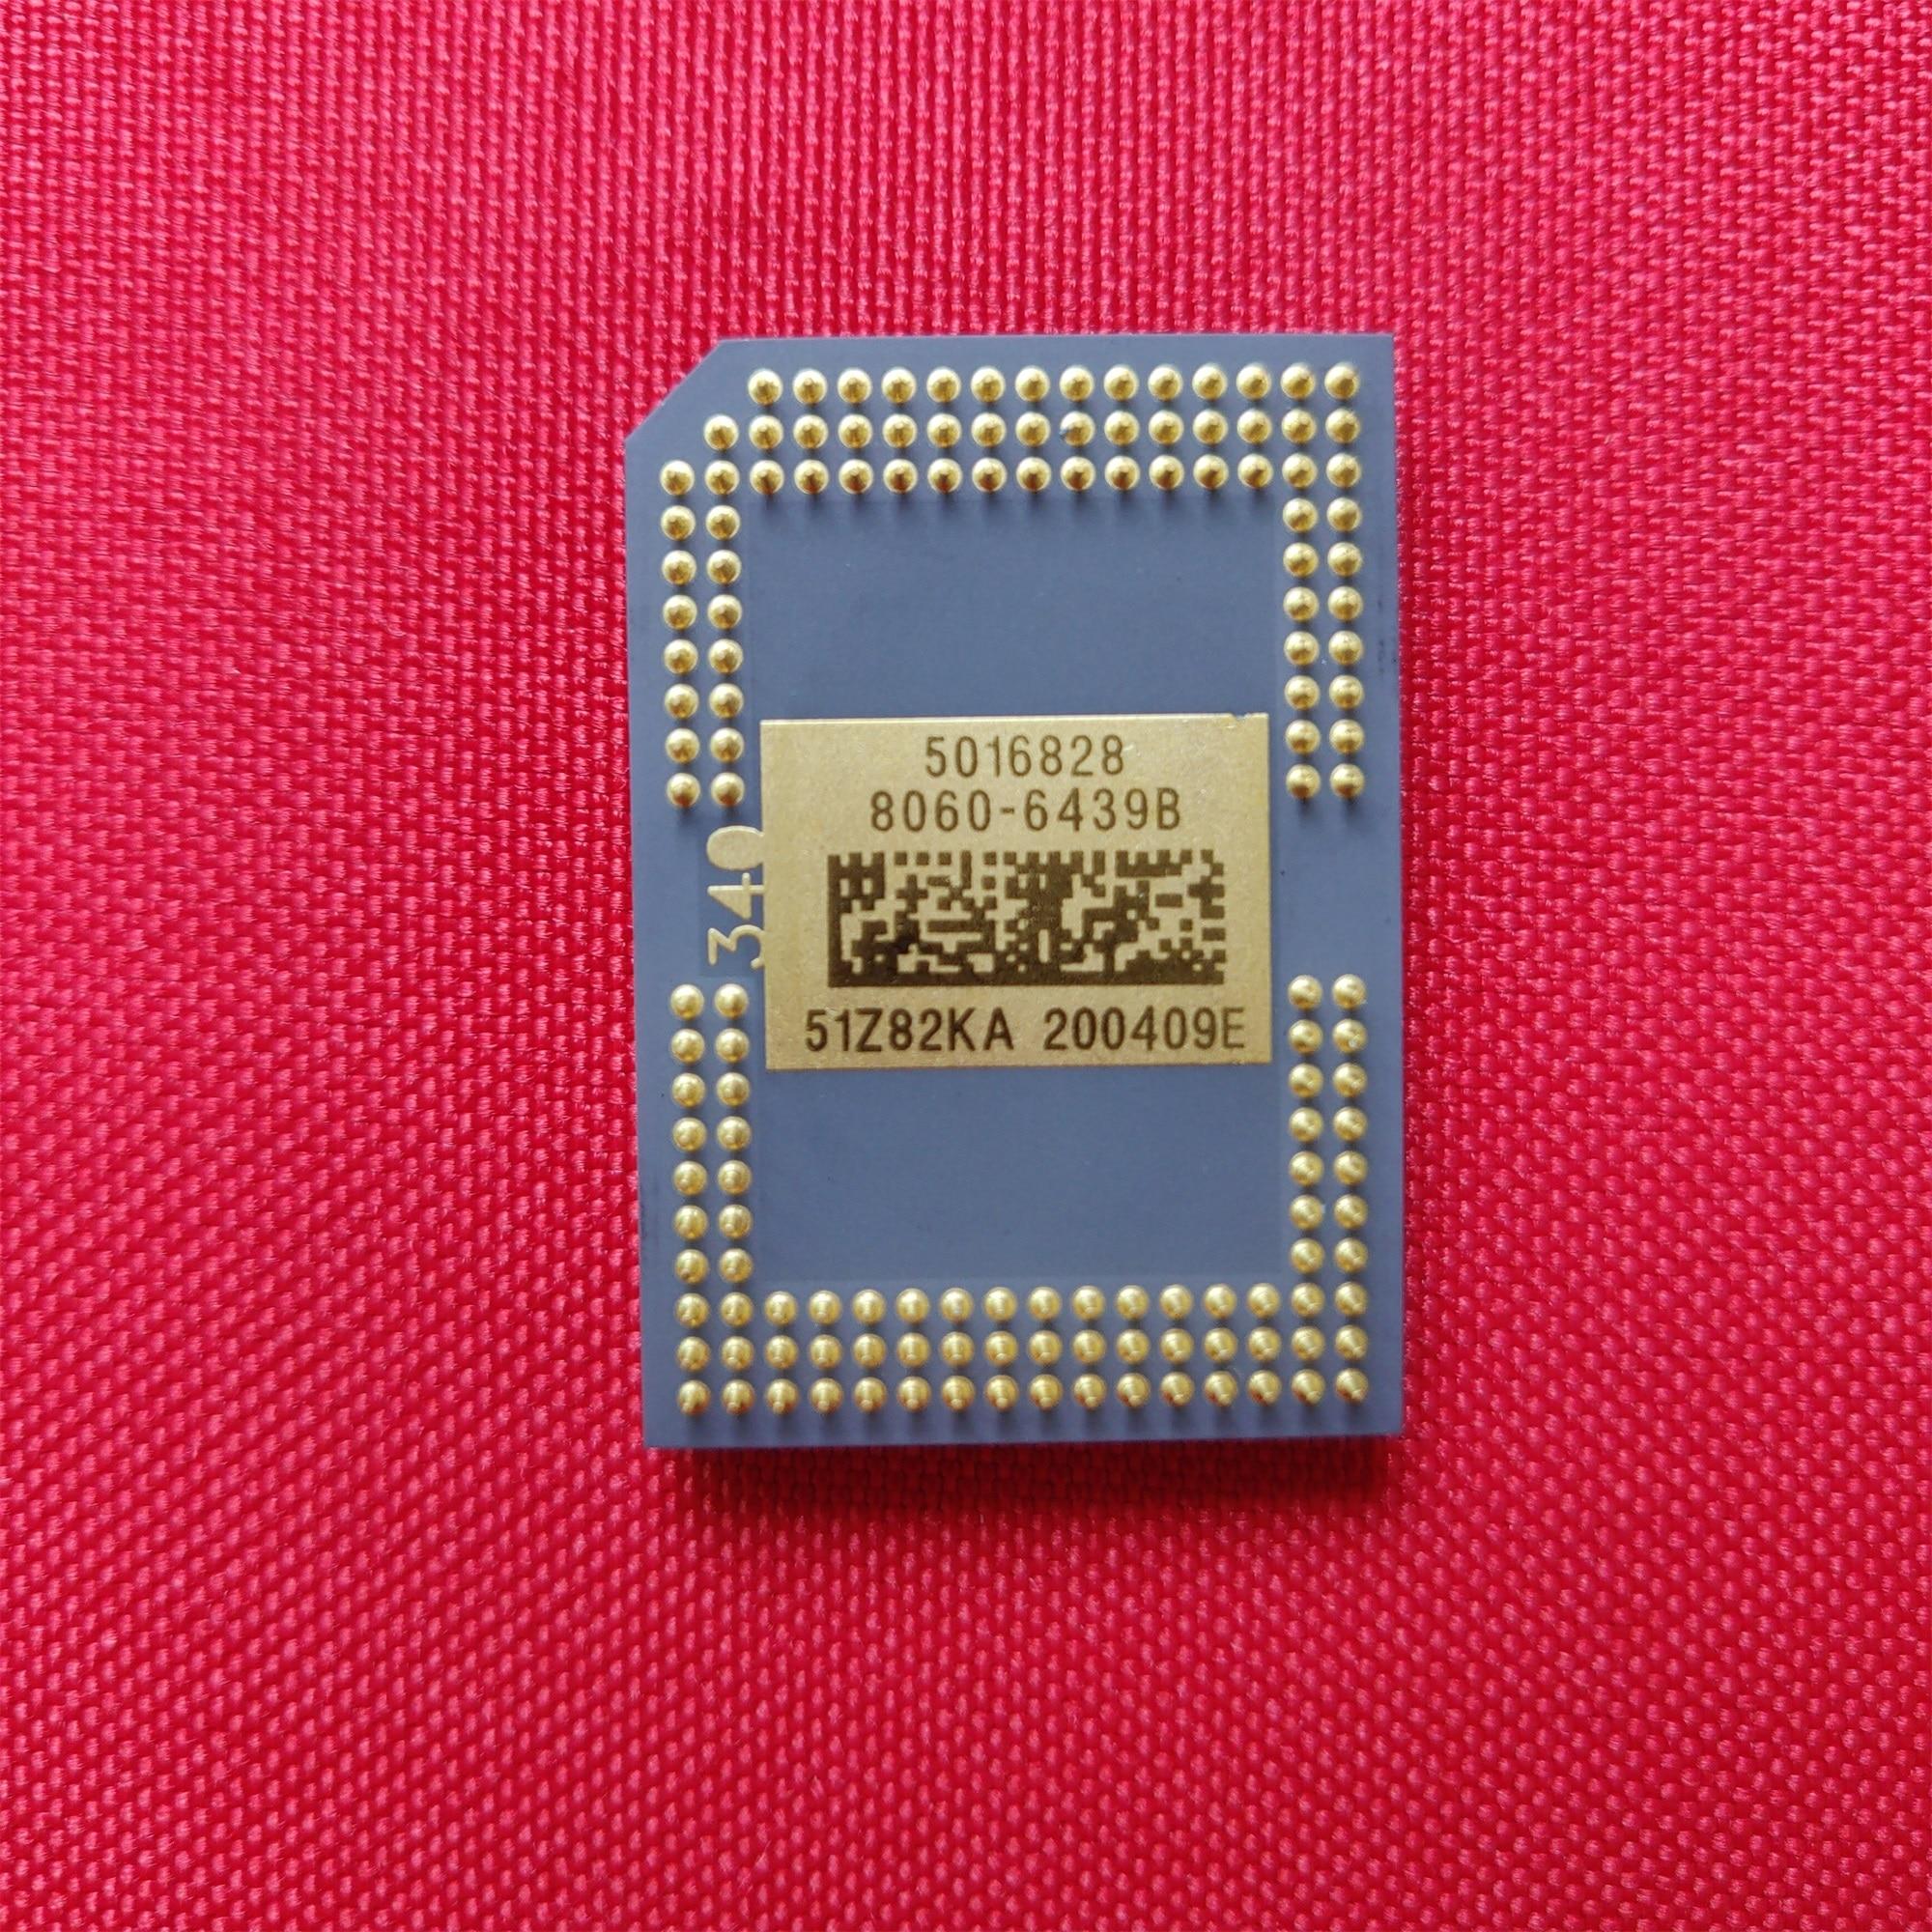 Microplaquetas originais novas 8060-6439b 8060-6438b 8060-6038b 8060-6138b 8060-6338b 8060-6338b para benq mp515/benq mp515st